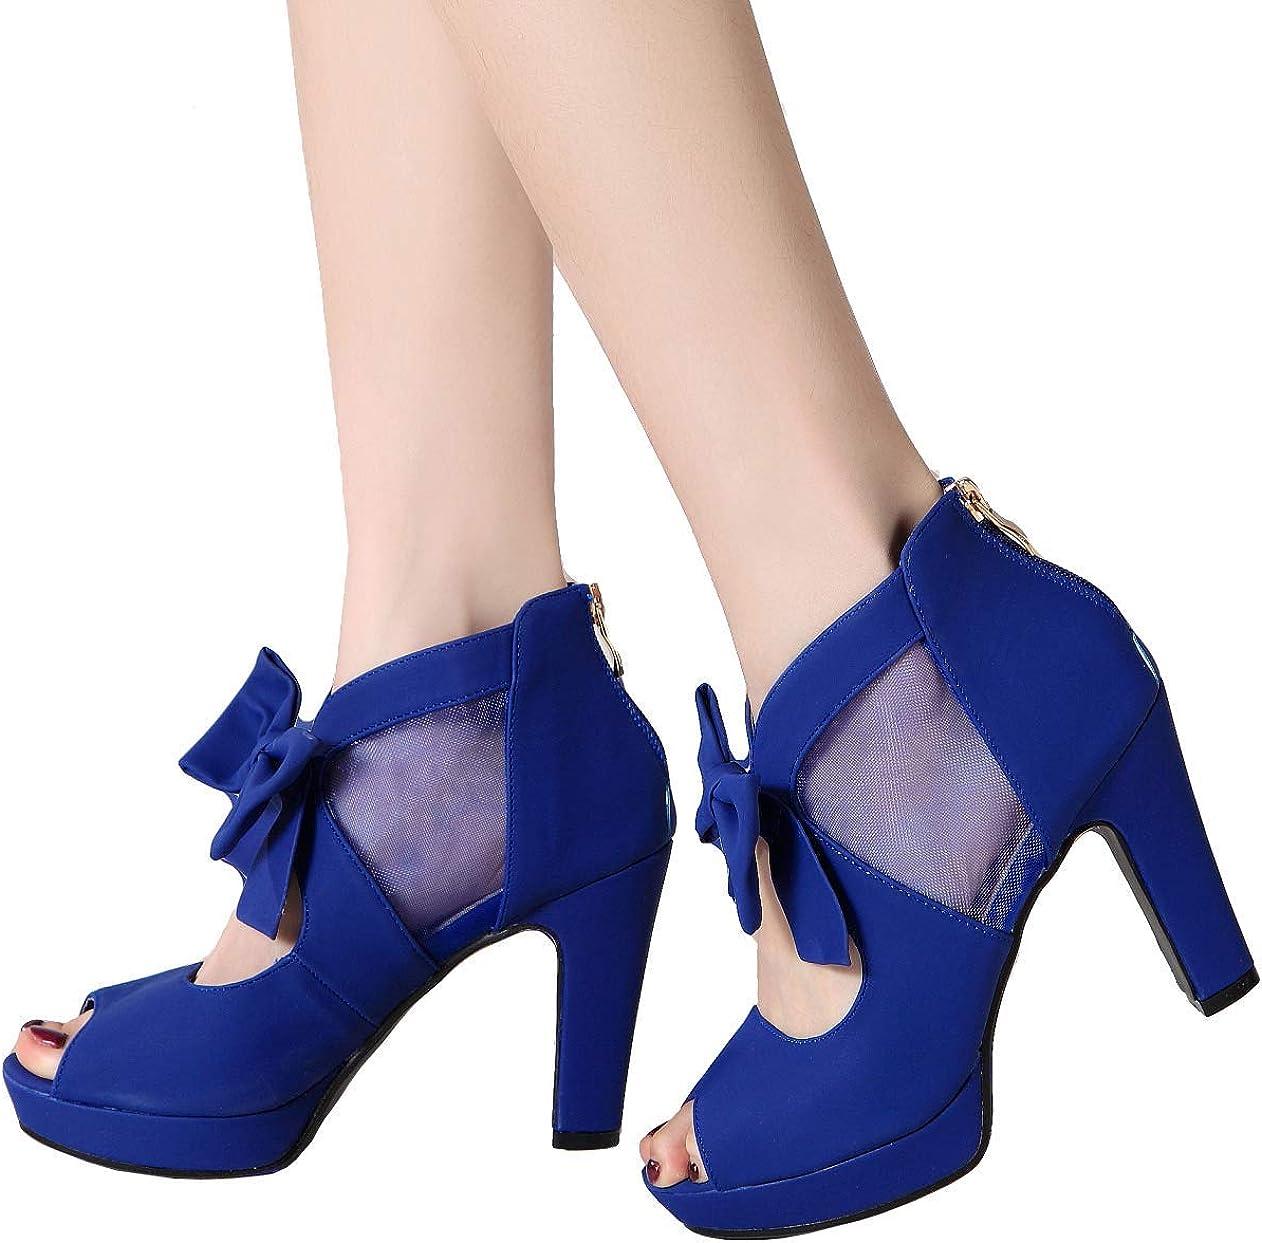 GATUXUS Open Toe Women Platform High Heel Shoes Bows Strappy Sandals